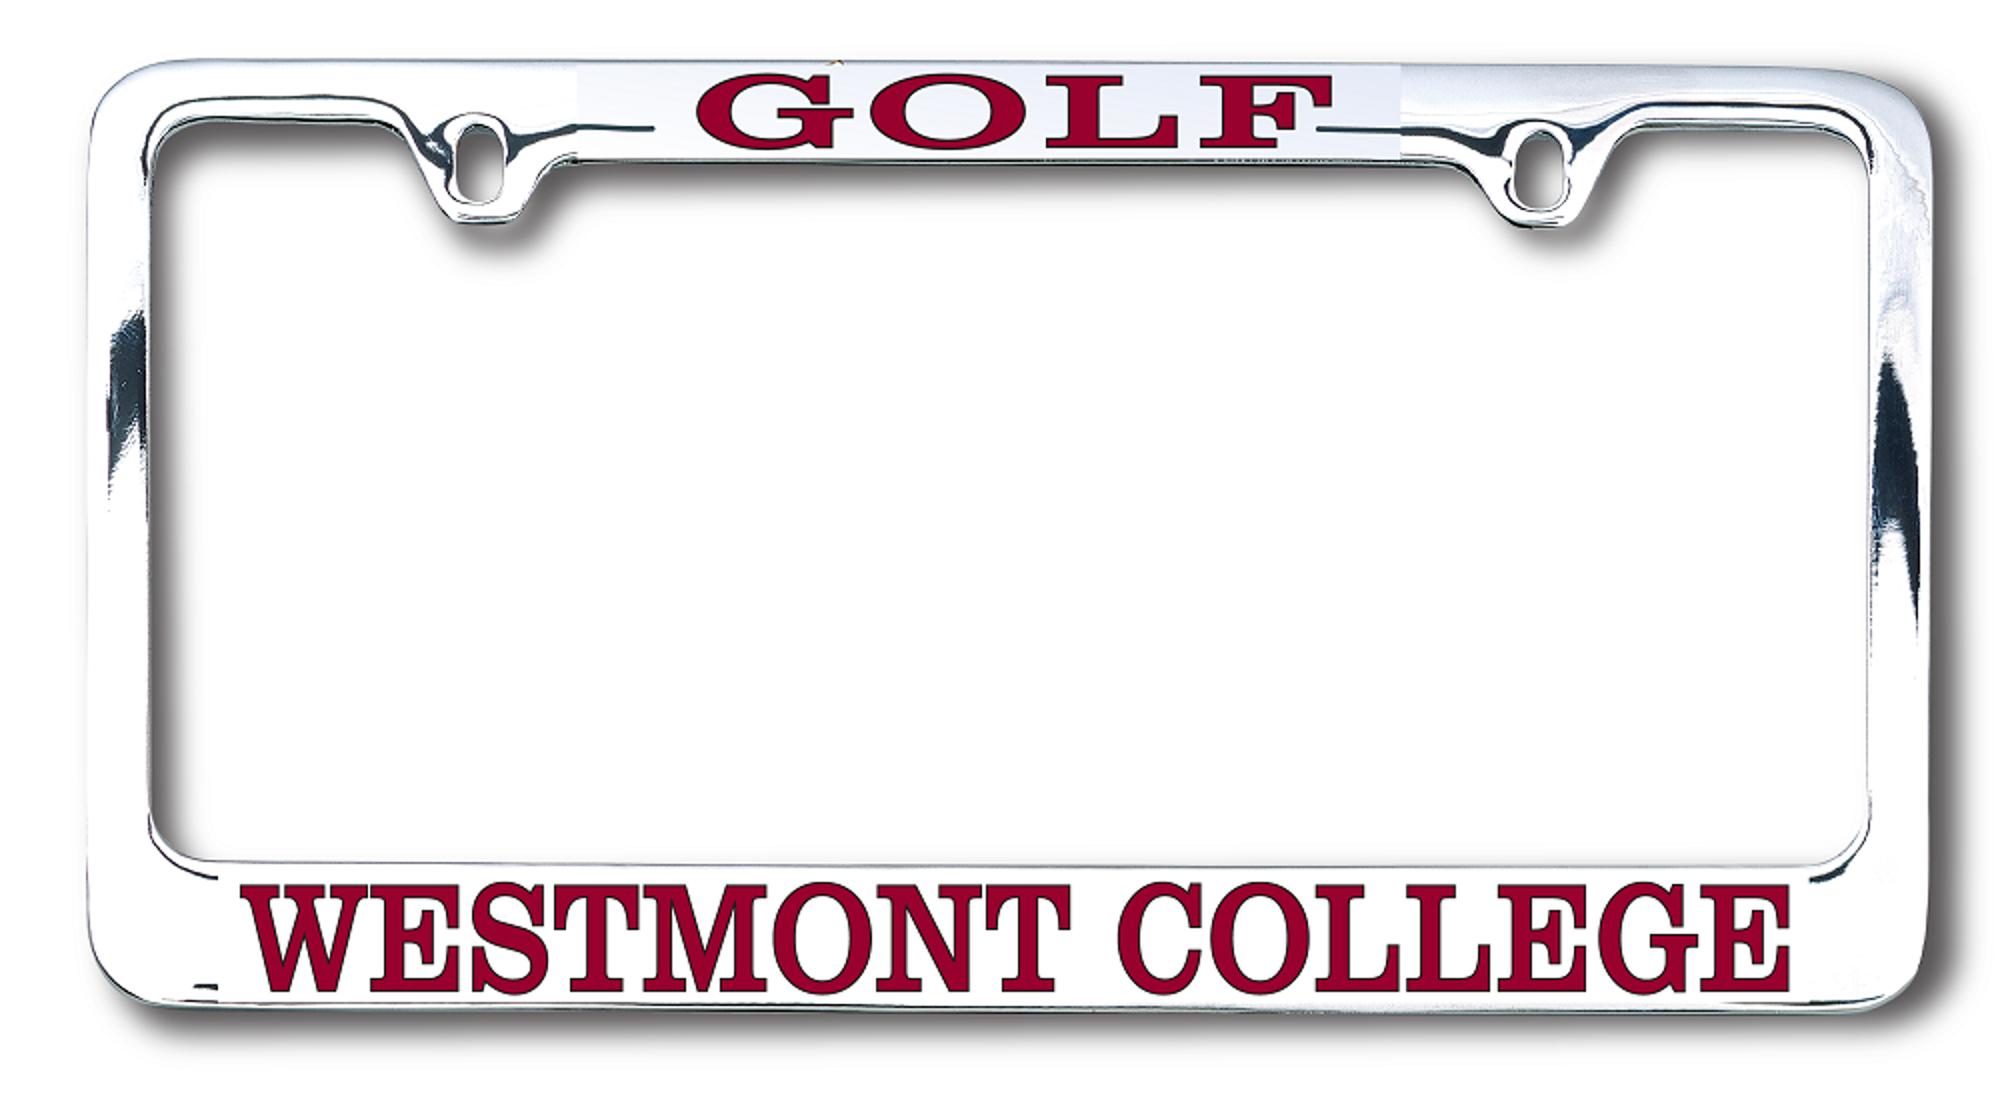 image of: Westmont Chrome Golf License Plate Frame